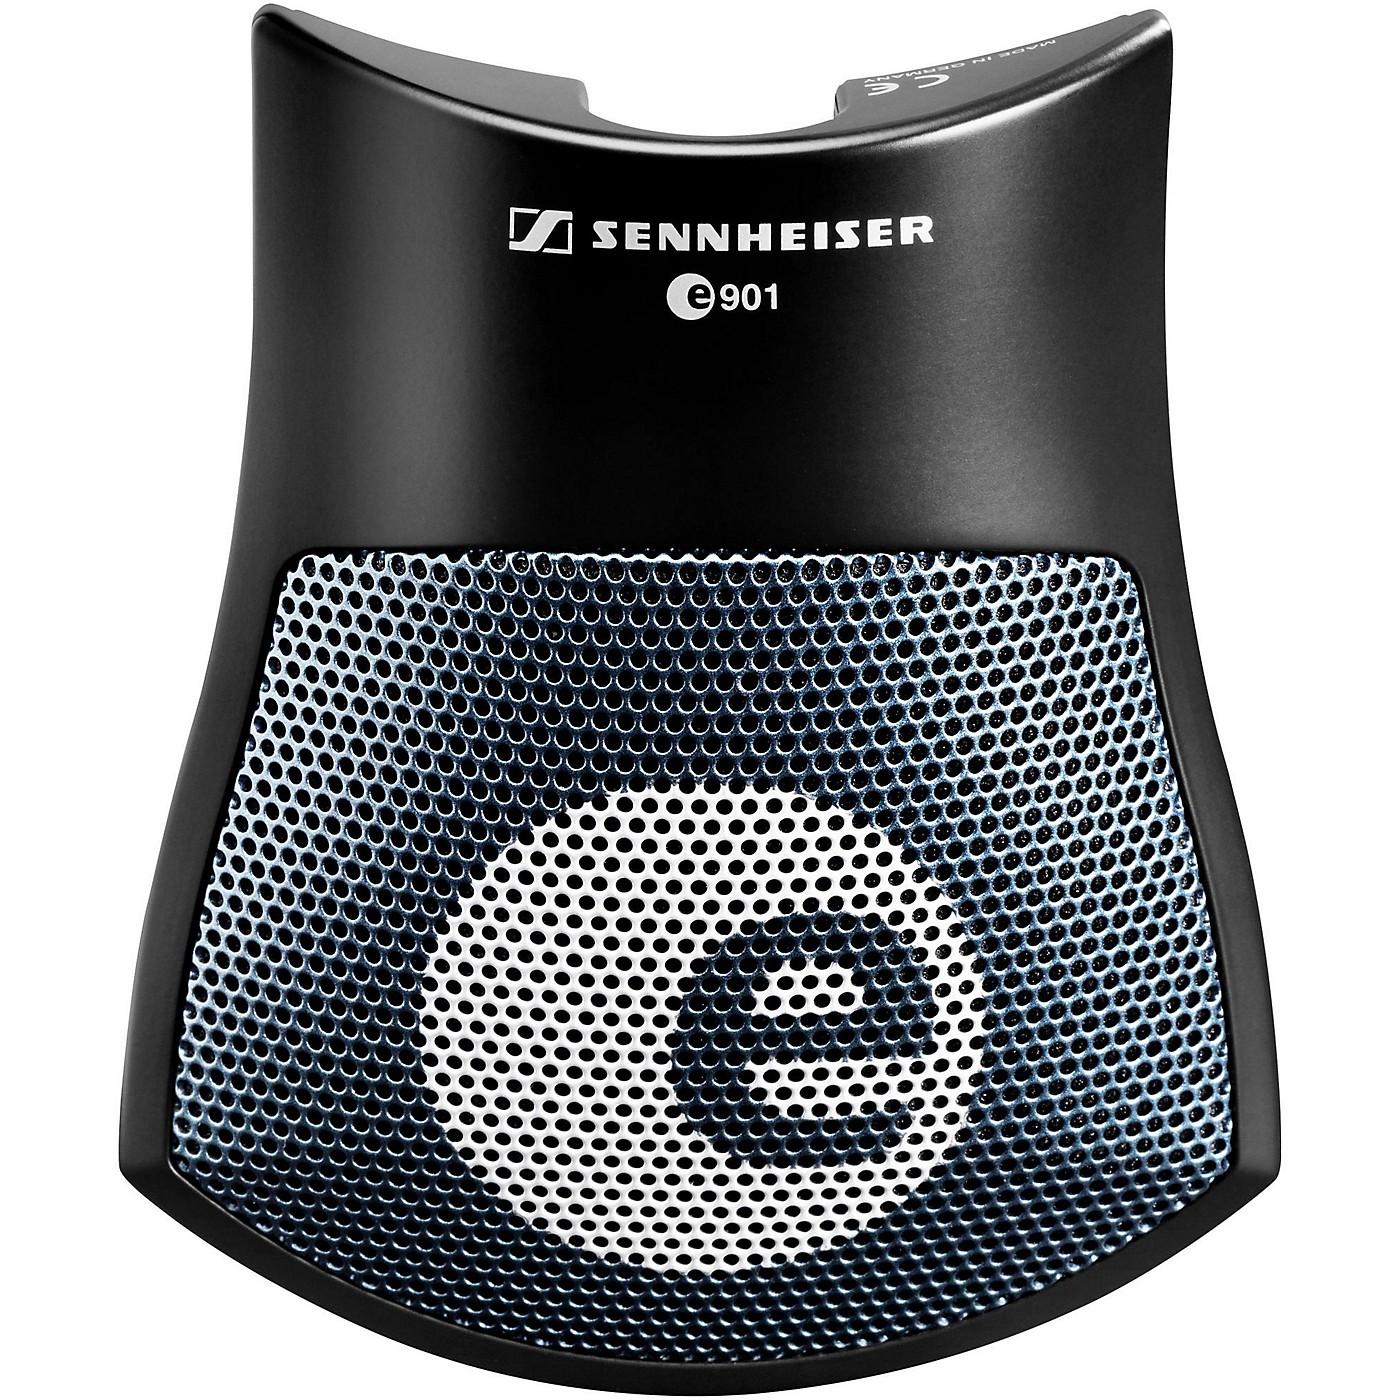 Sennheiser evolution e 901 Cardioid/Boundary Instrument Microphone thumbnail